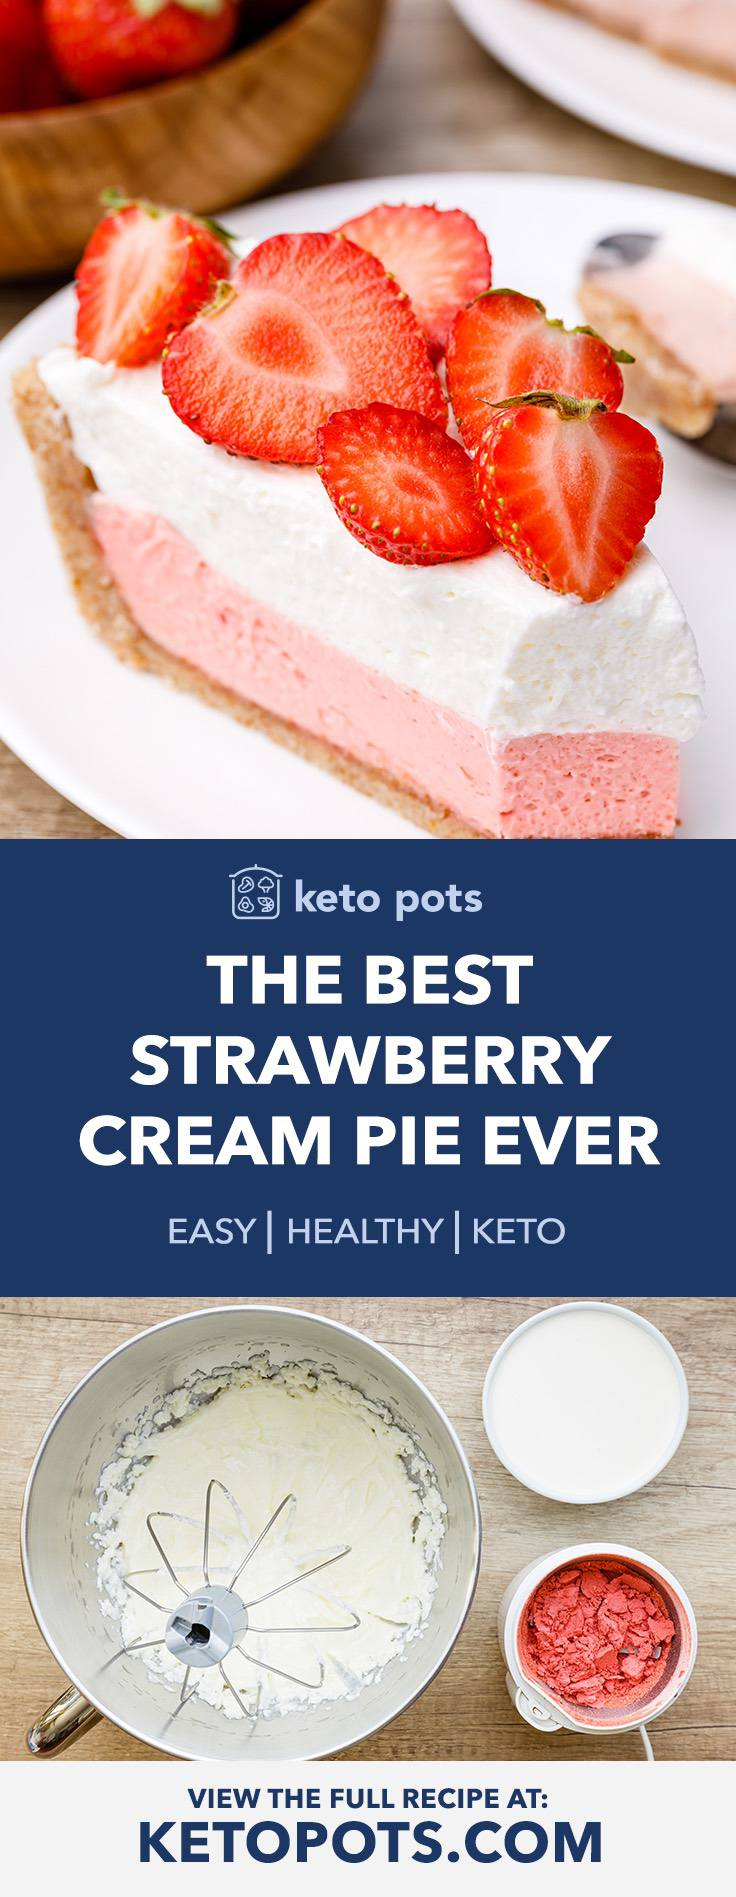 The Best Strawberry Cream Pie Ever